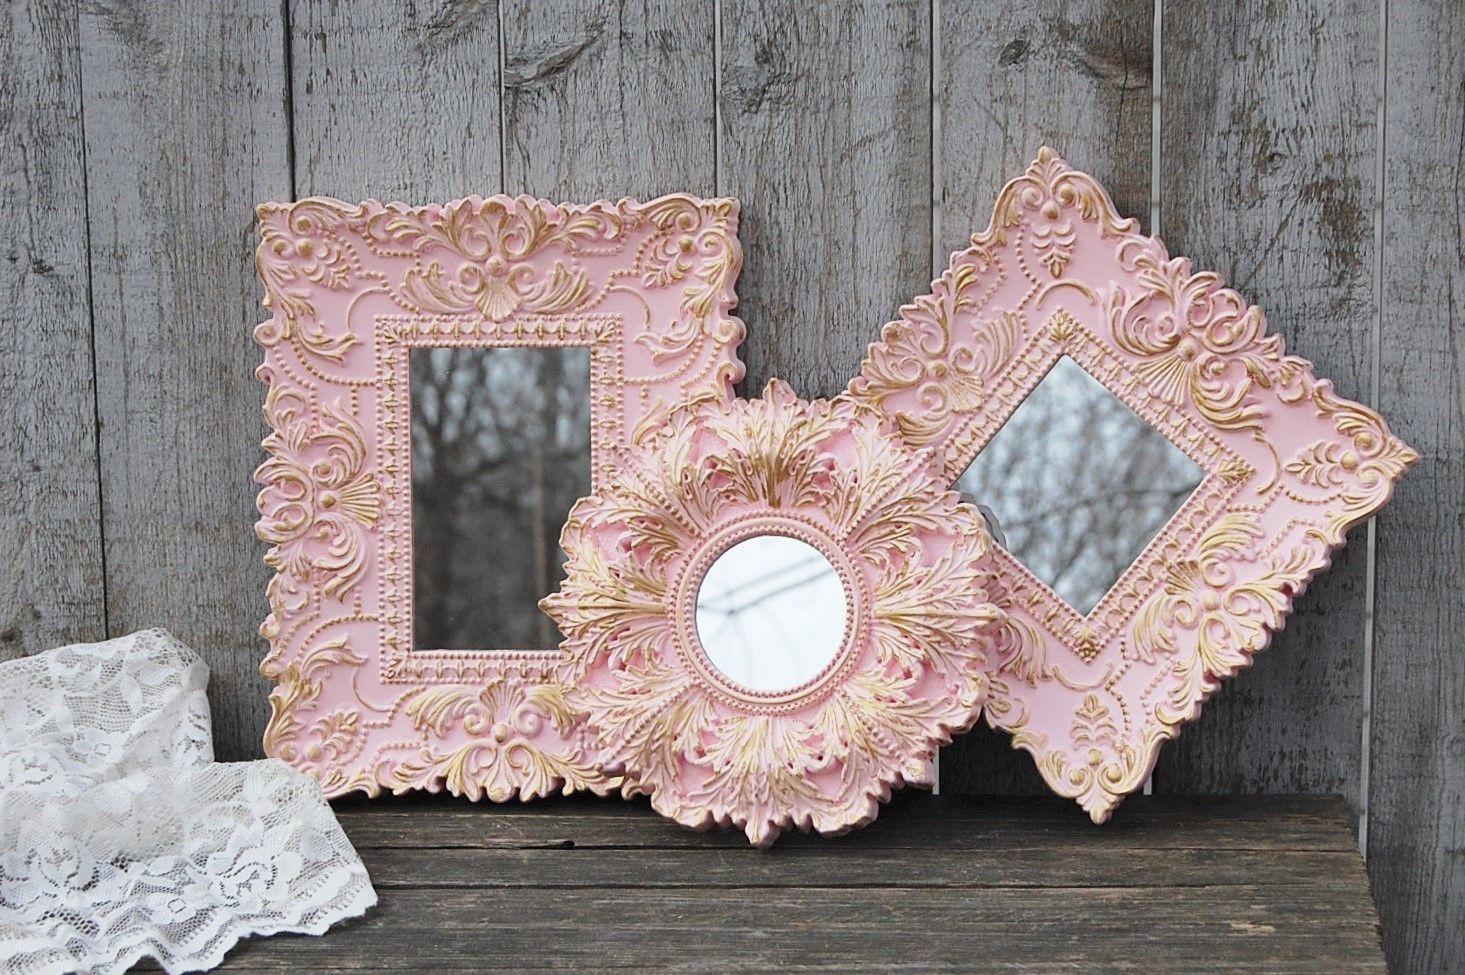 creative handmade mirrors - HD1465×975